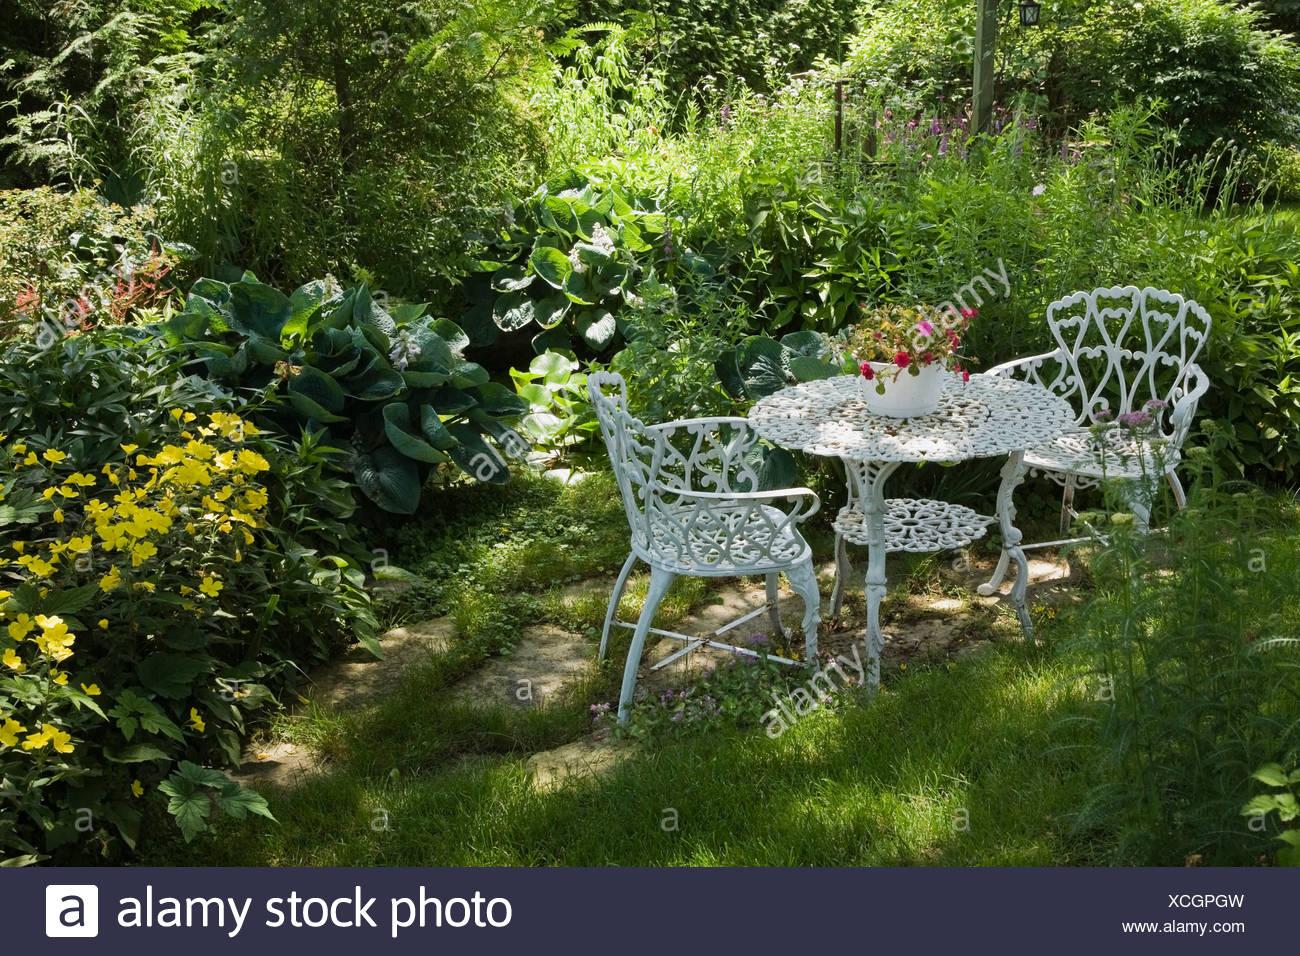 Tavoli E Sedie Da Giardino In Metallo.Metallo Bianco Tavolo E Sedie Da Giardino In Una Zona Residenziale